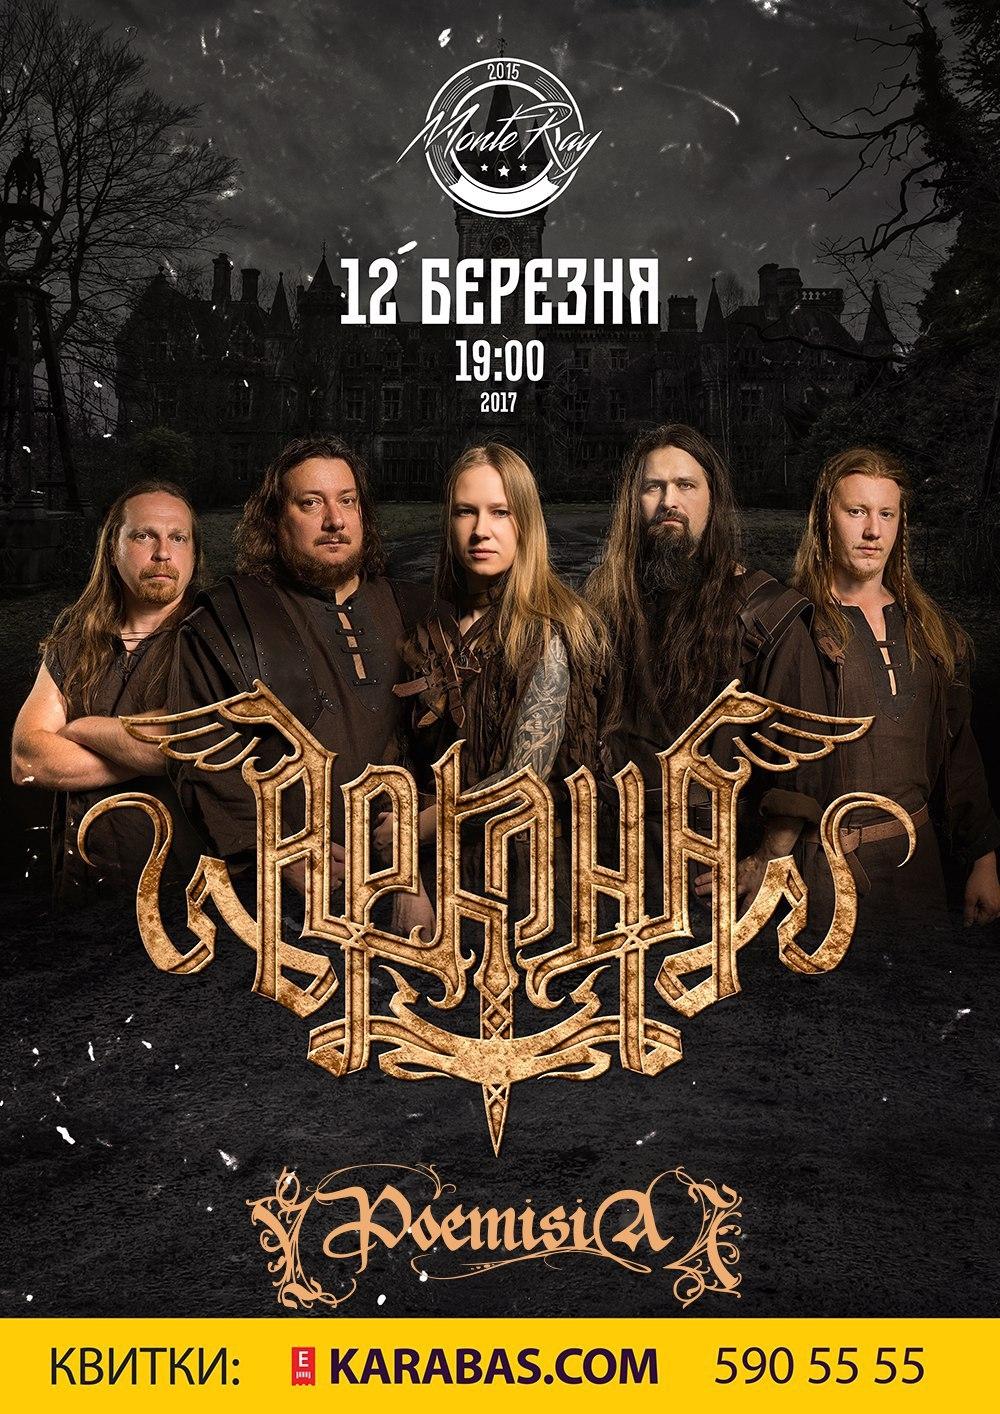 12.03 АРКОНА | Киев